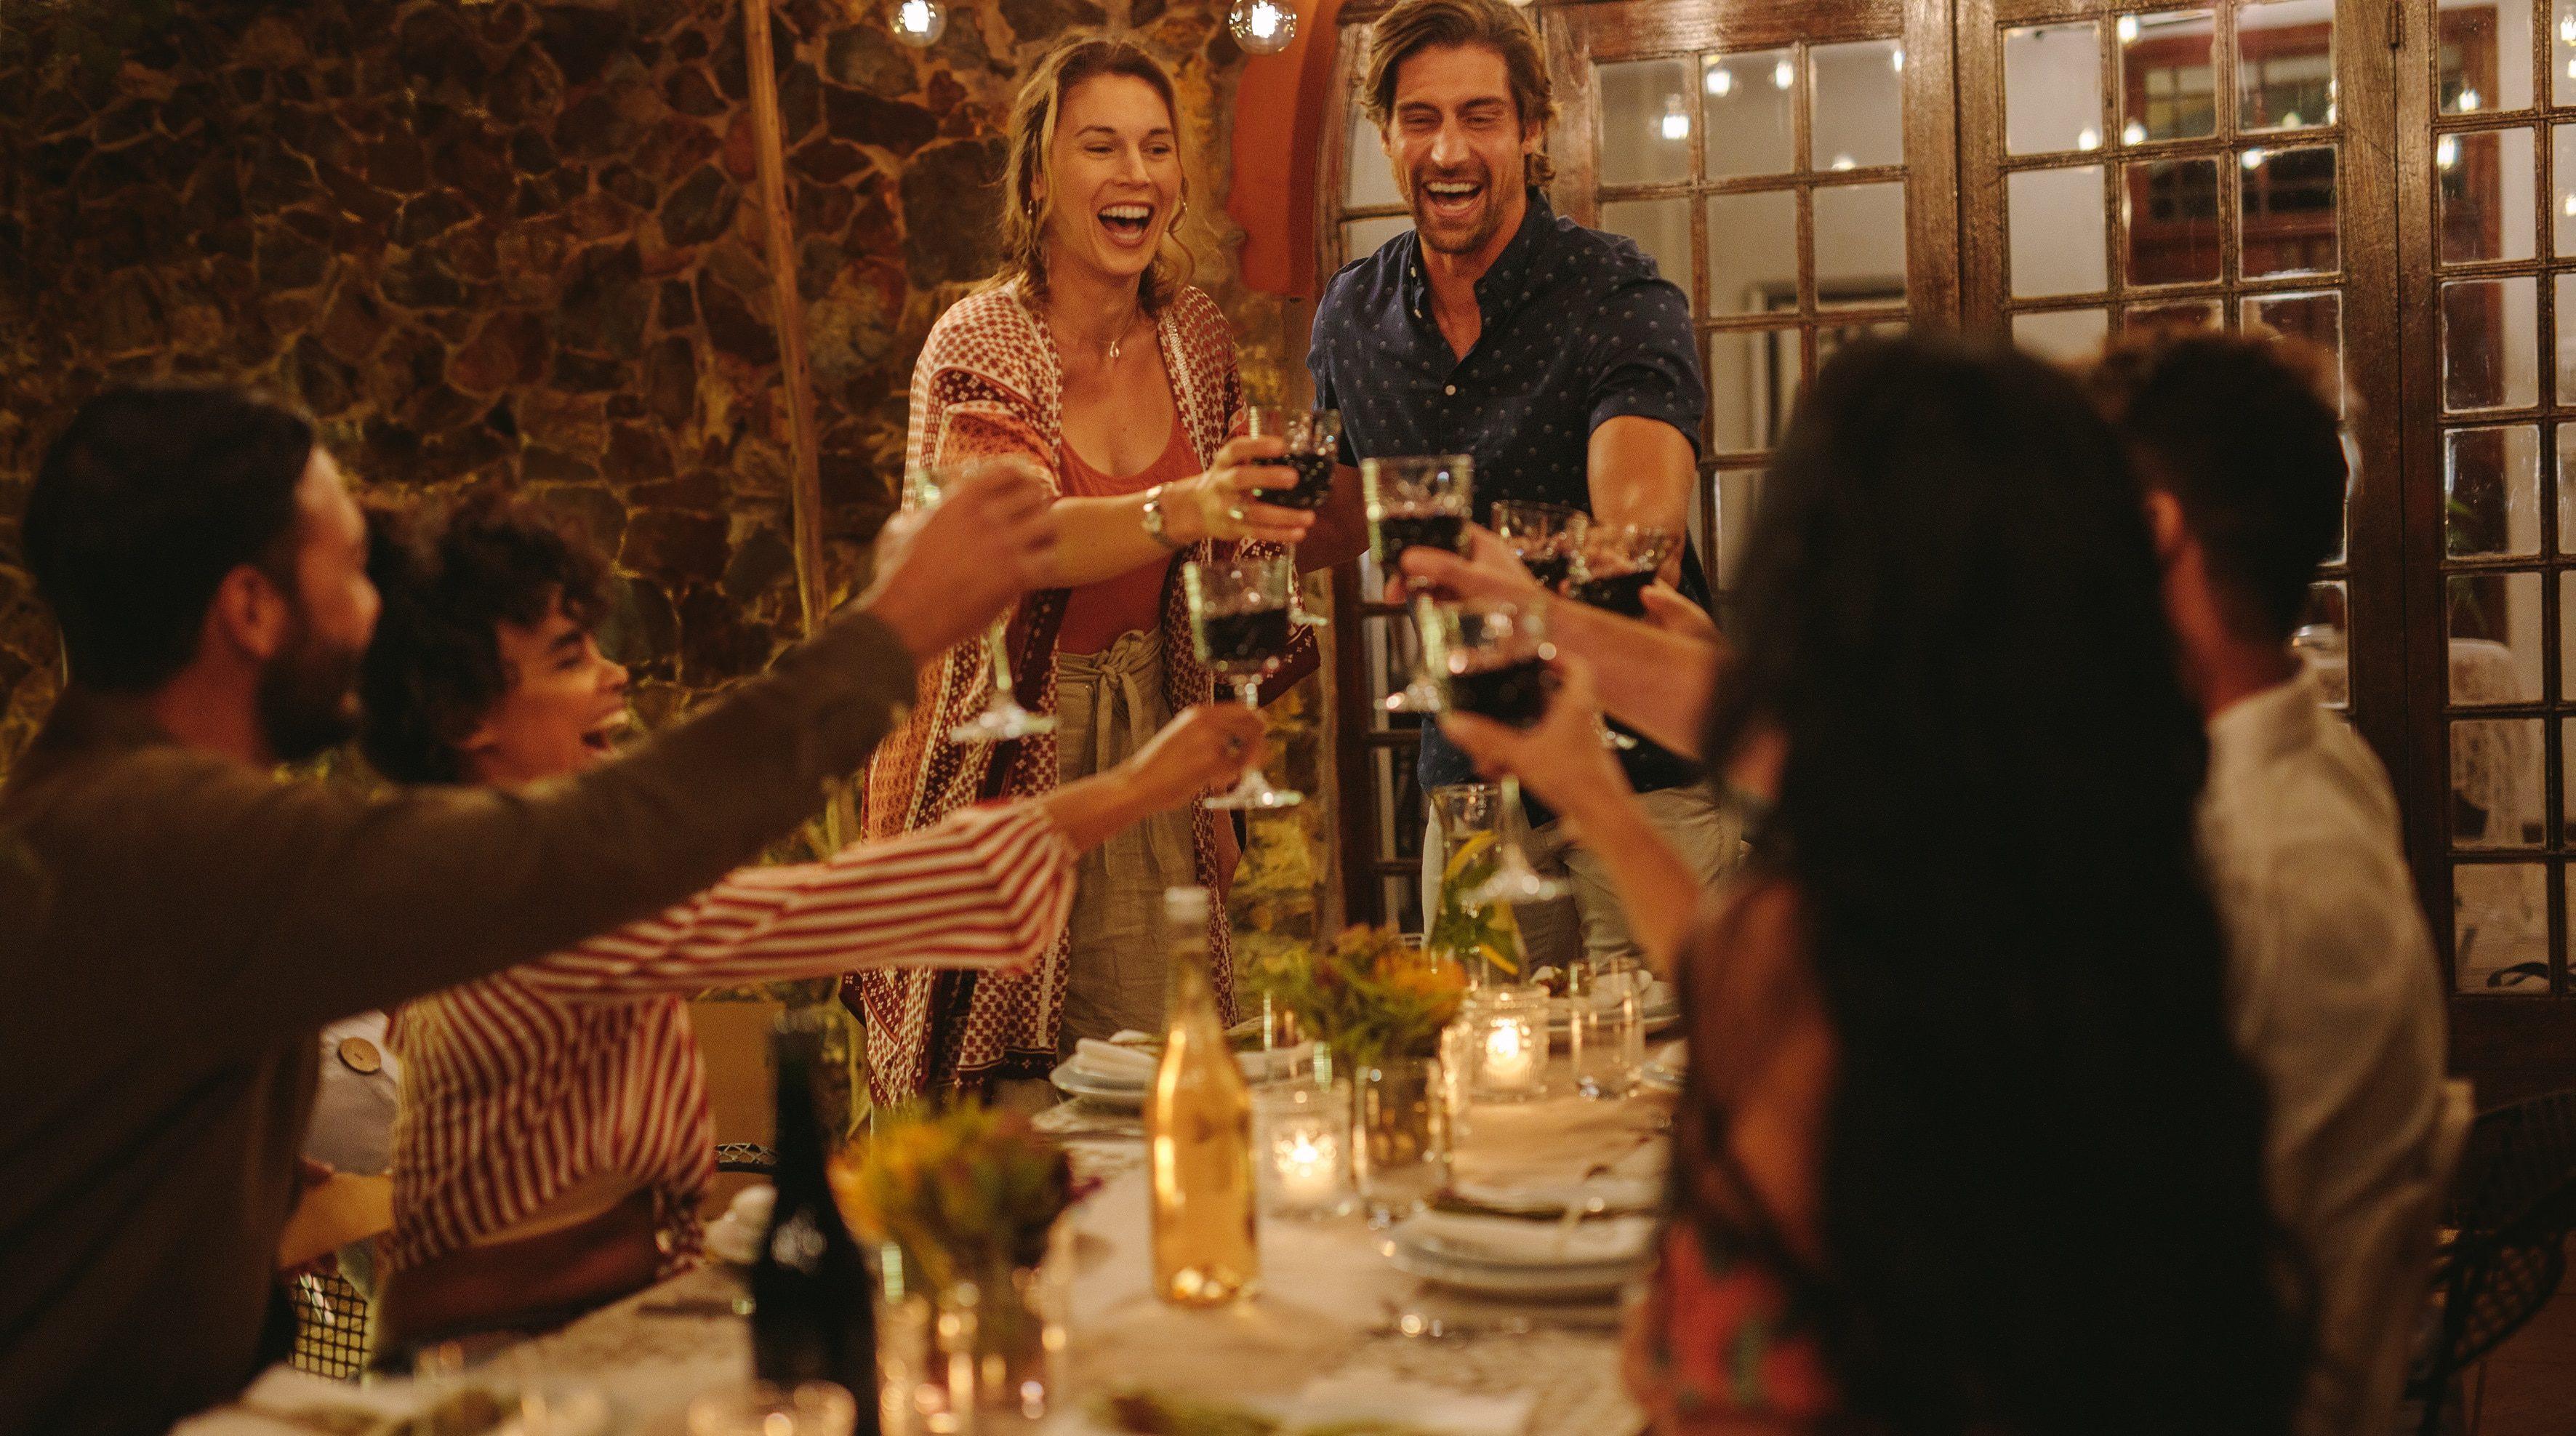 Tip For hosting a dinner party